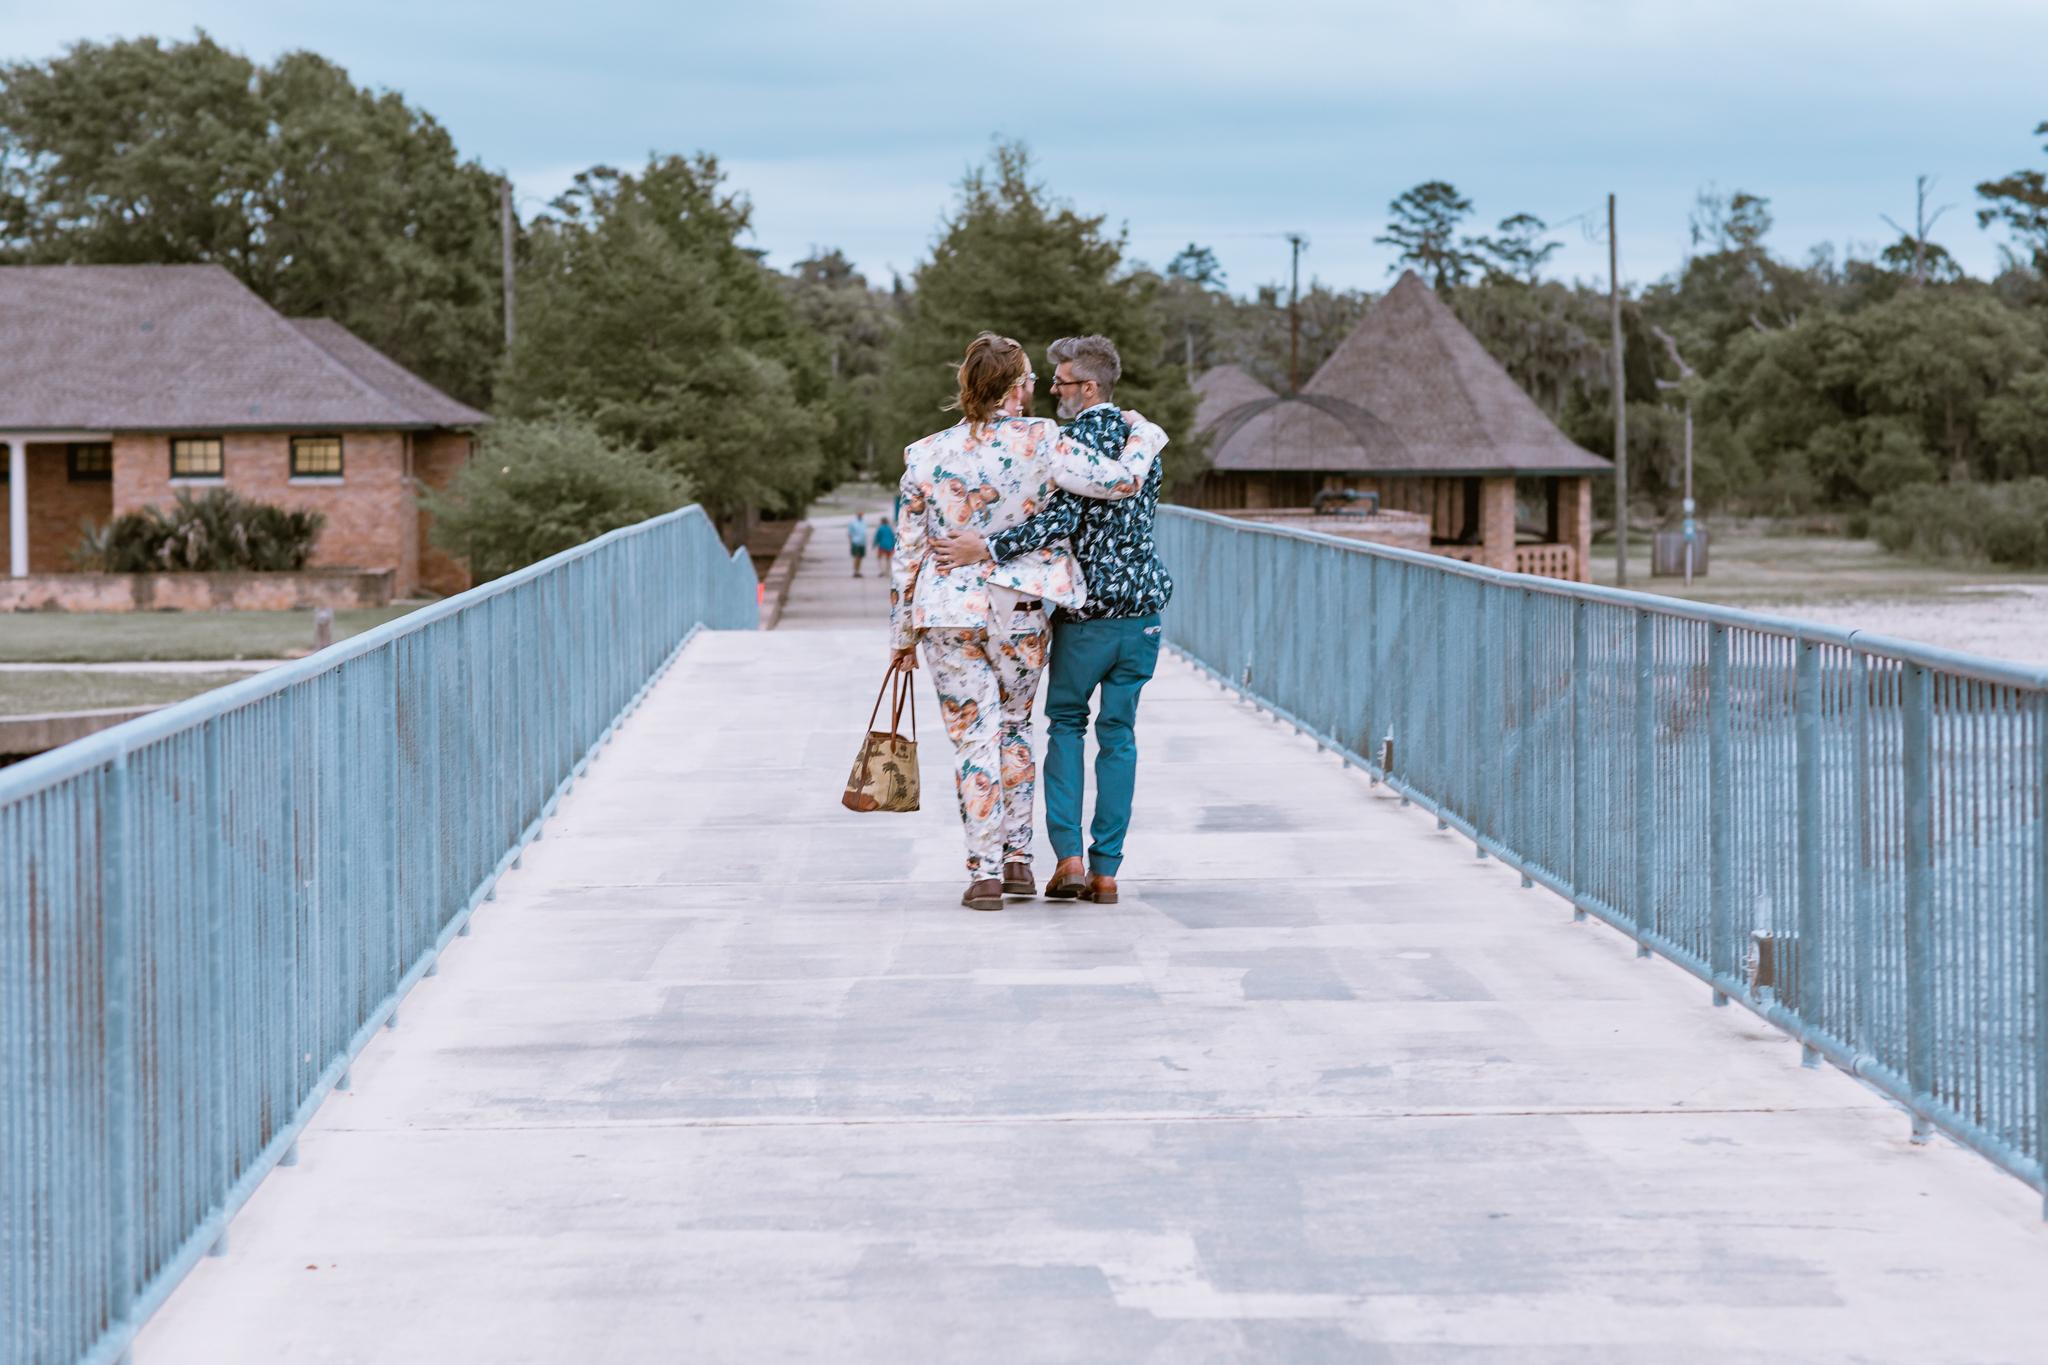 Tim and David - New orleans Wedding - Kallistia Photography-17.jpg